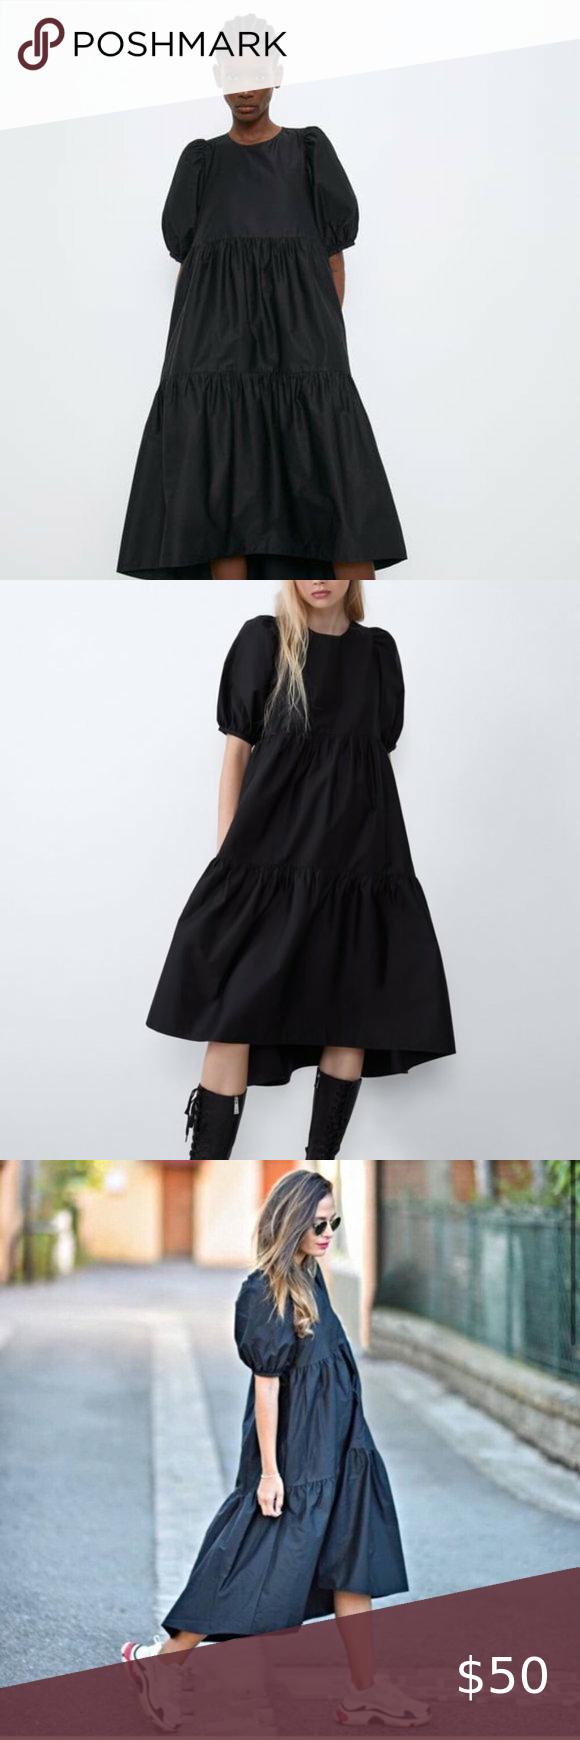 Zara Balloon Sleeve Black Poplin Dress Bnwot Poplin Dress Black Poplin Dress Short Sleeve Dresses [ 1740 x 580 Pixel ]